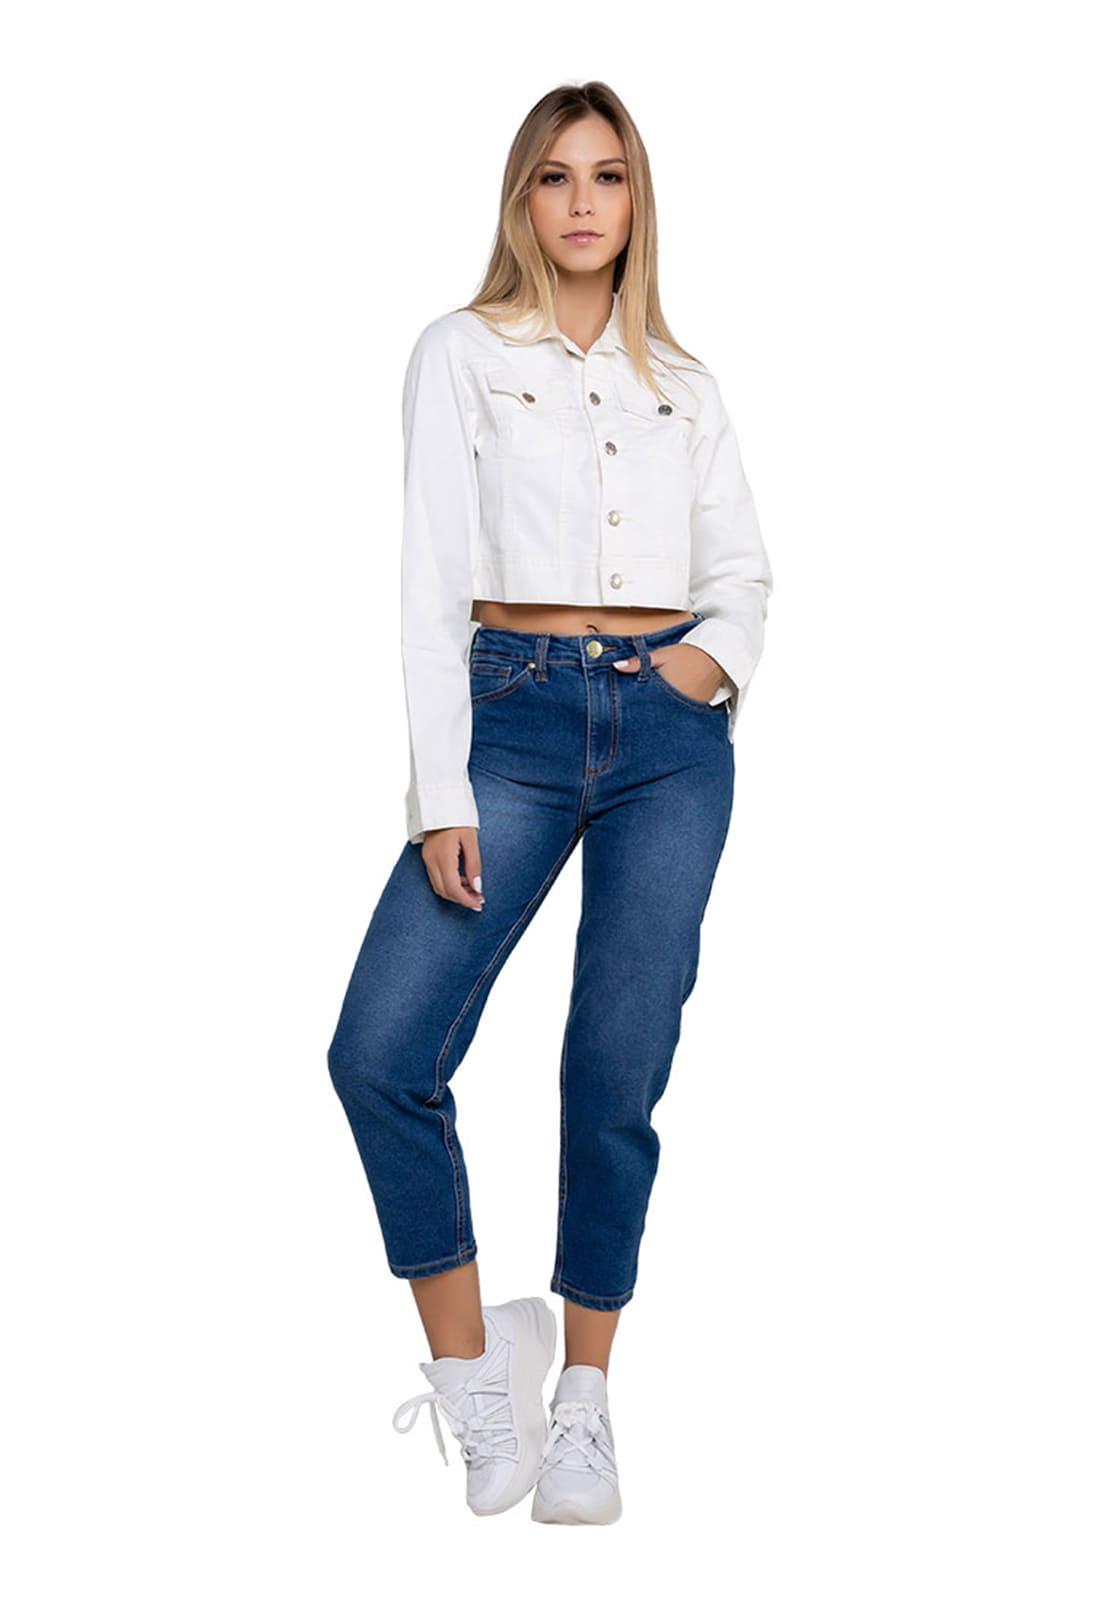 Jaqueta Jeans Feminina Latifundio com Elastano Off White